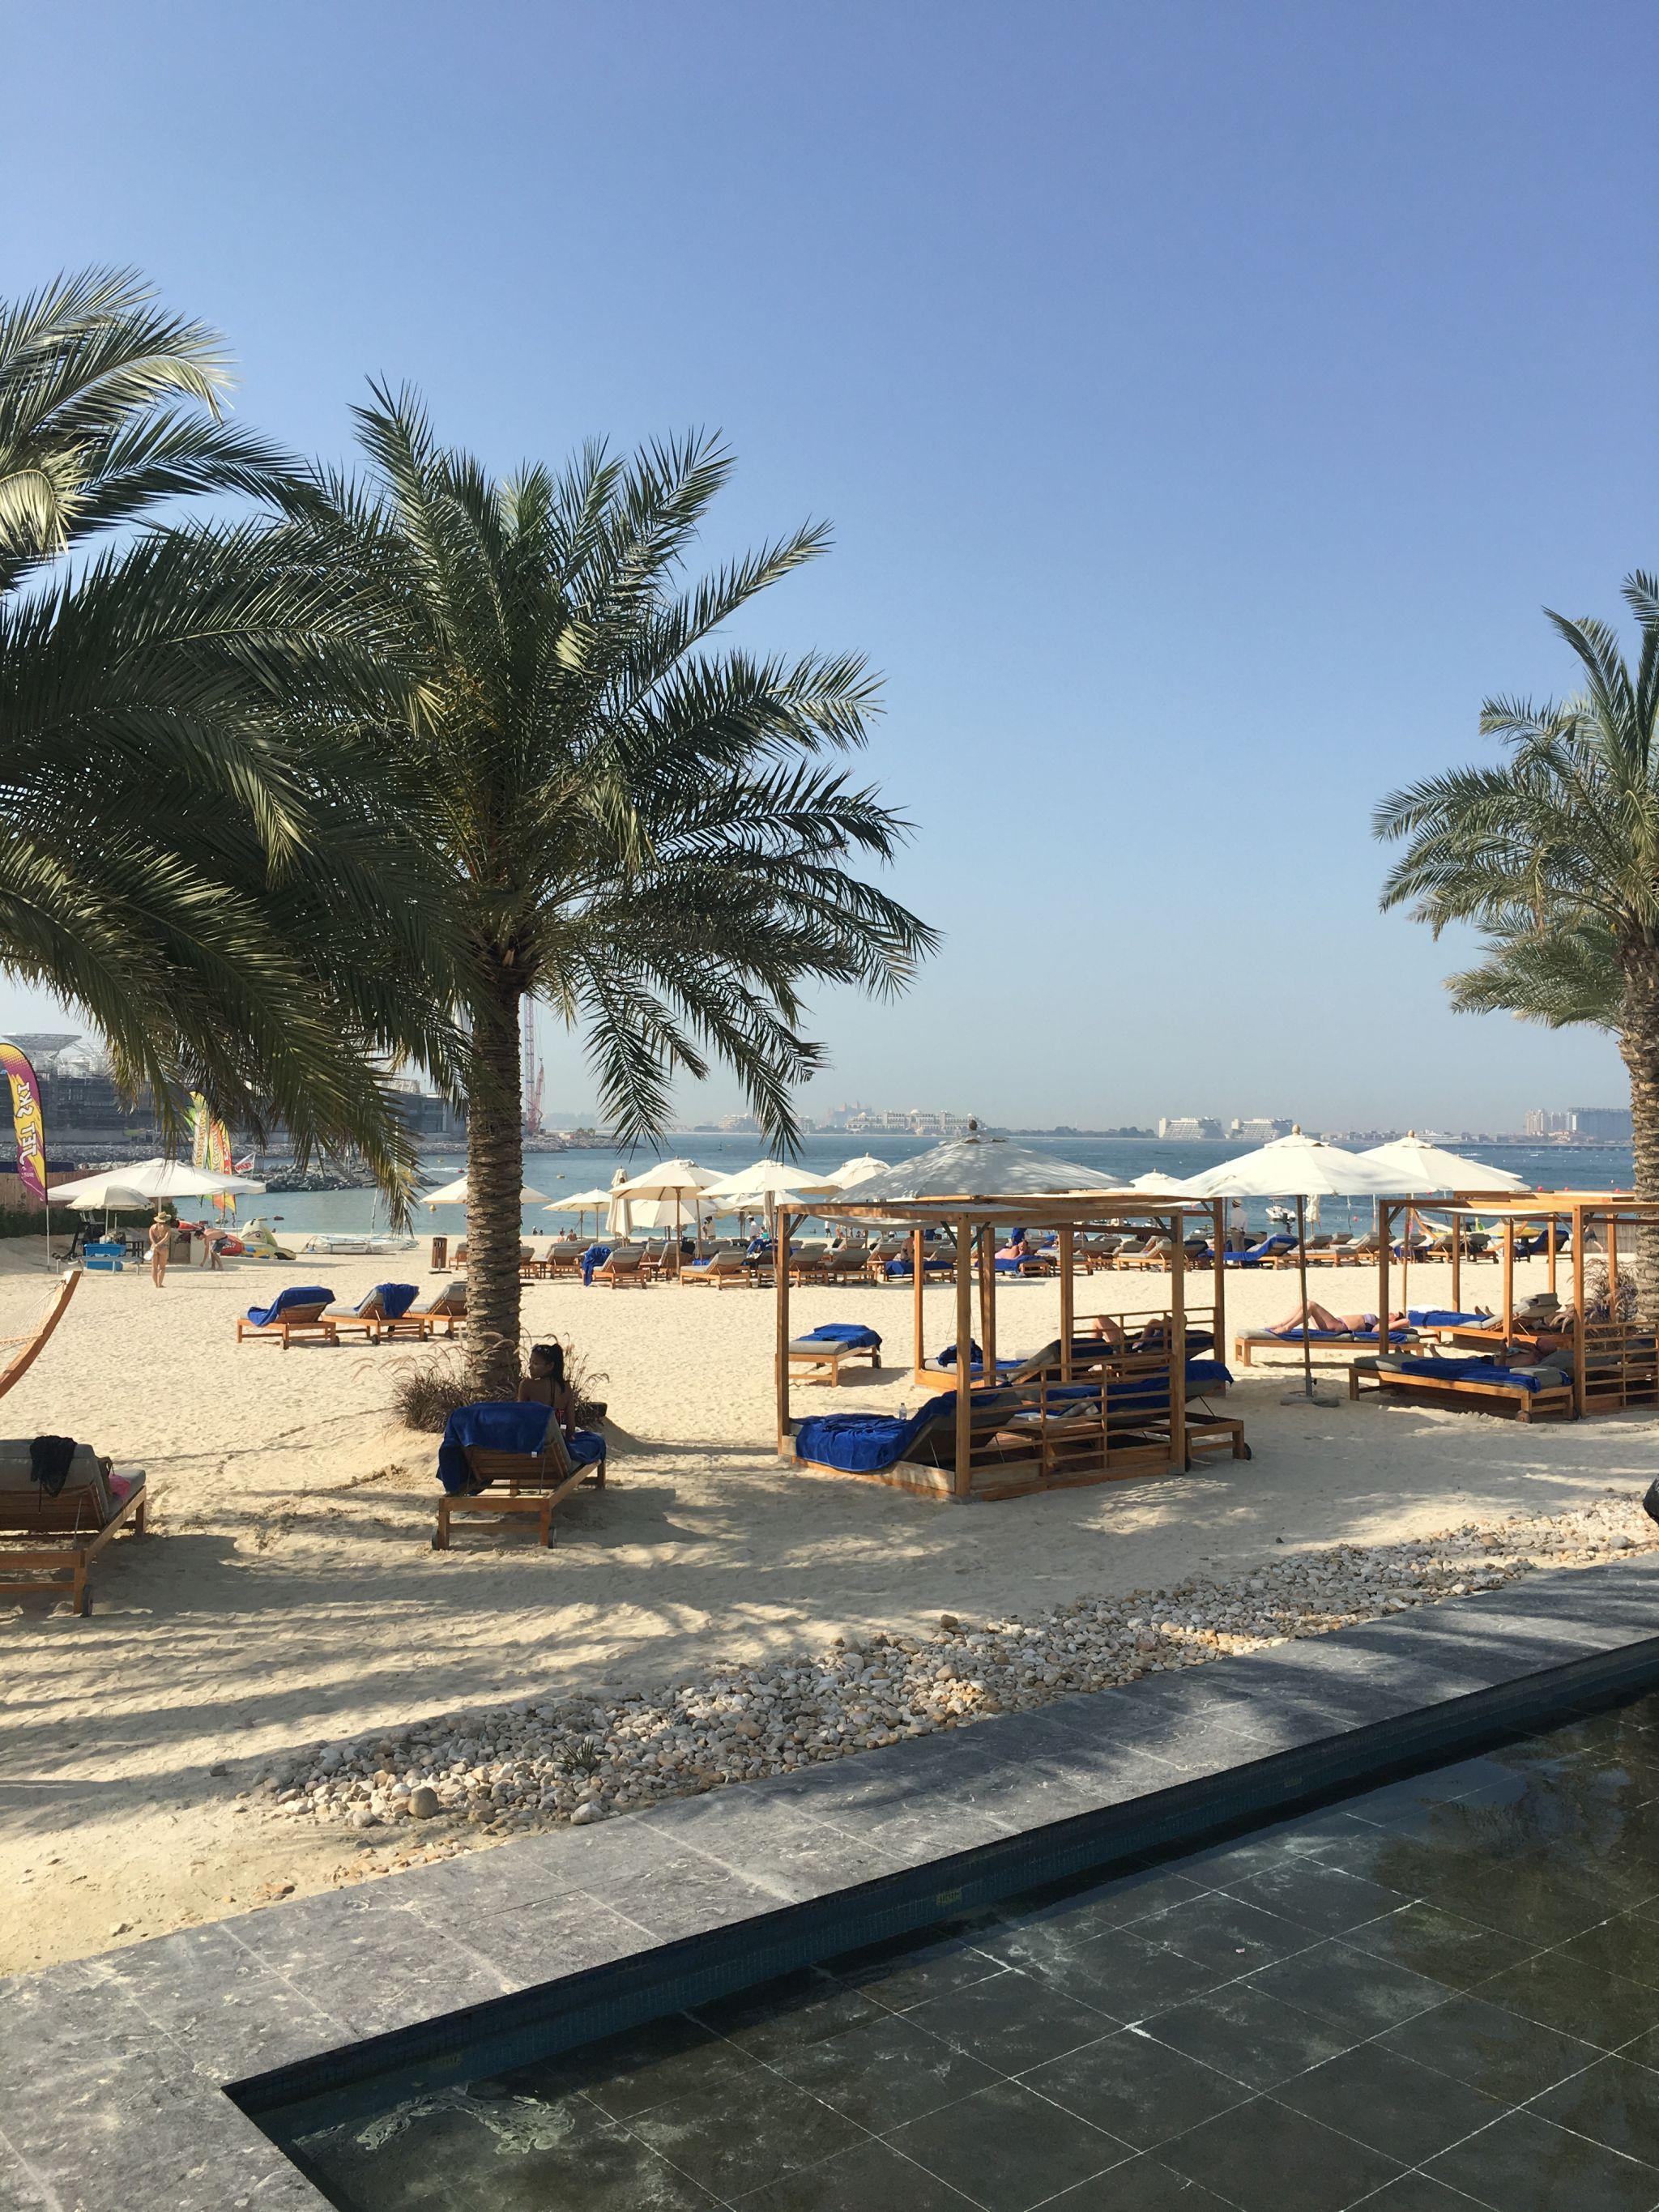 DoubleTree Hilton JBR Dubai